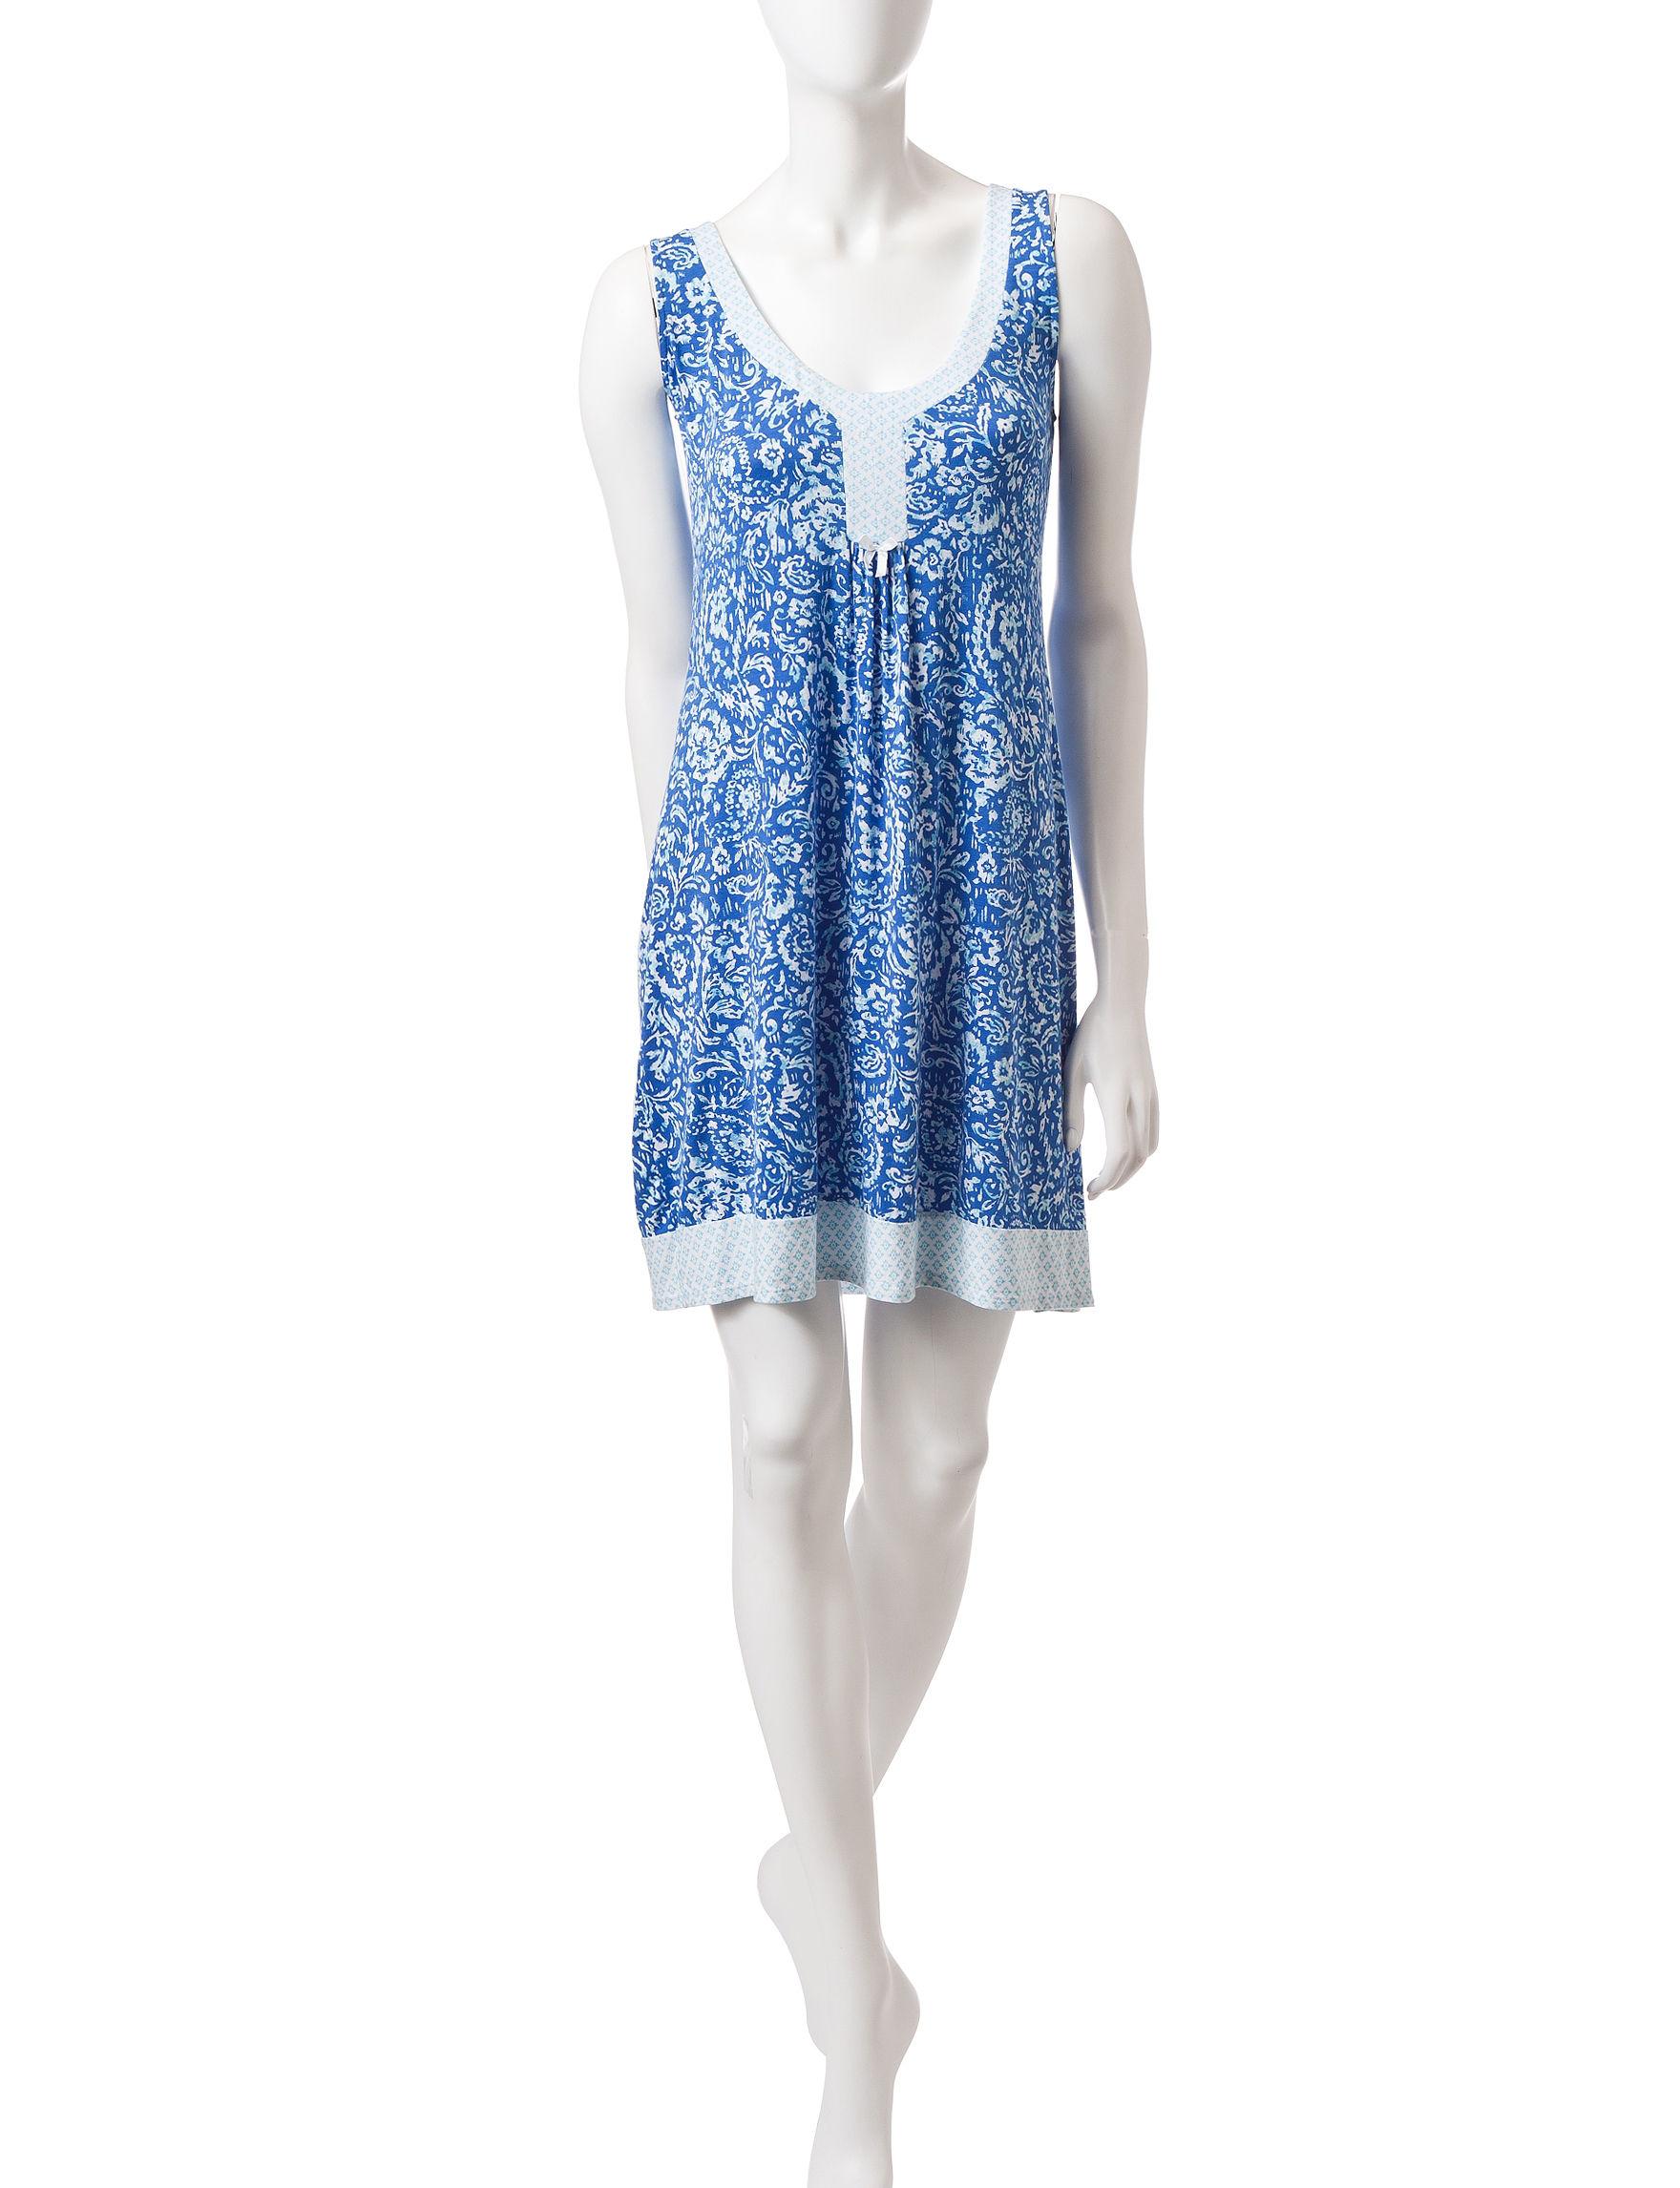 Laura Ashley Blue Multi Nightgowns & Sleep Shirts